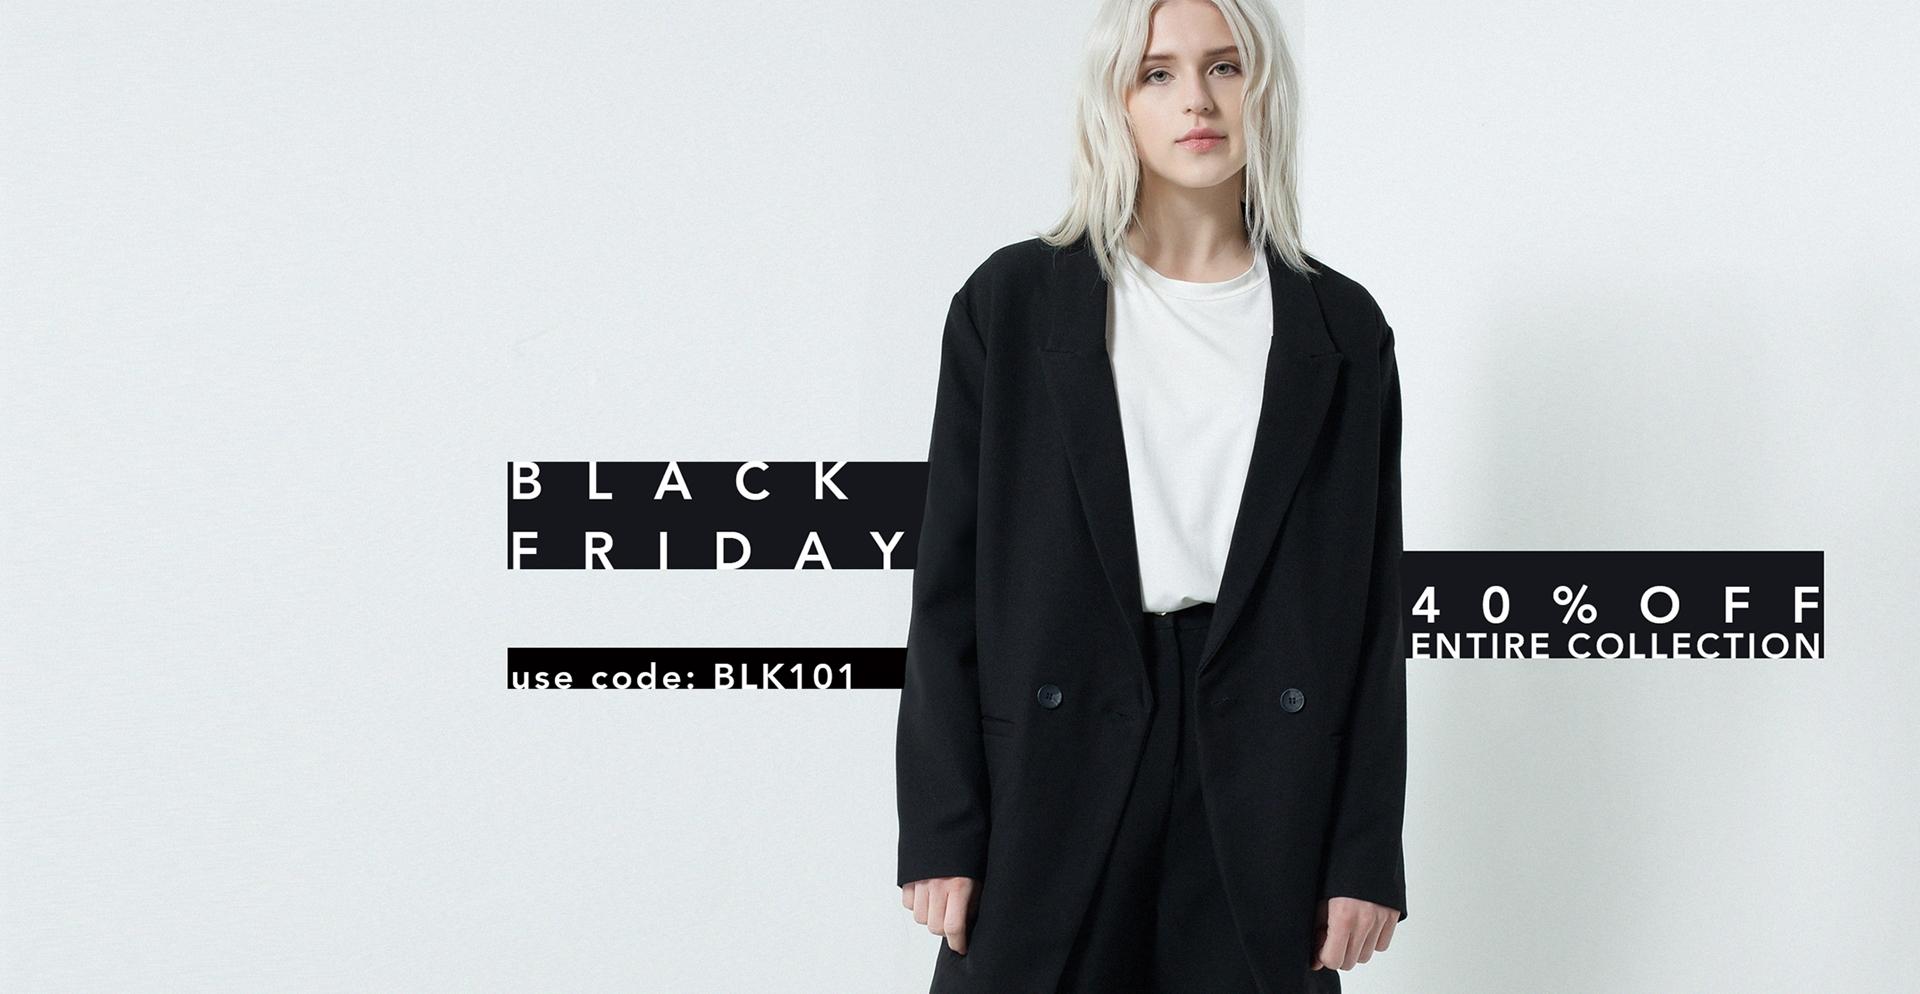 black friday poster.jpeg